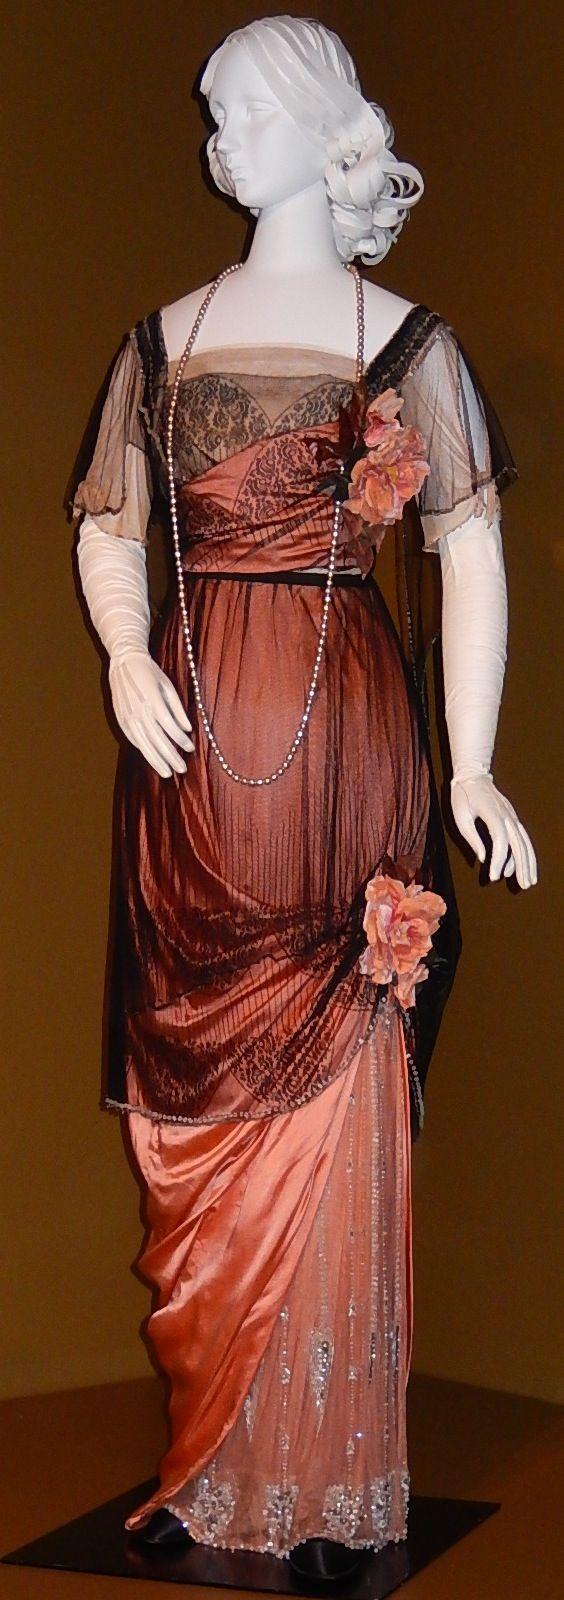 Evening Dress Jeanne Paquin 1912